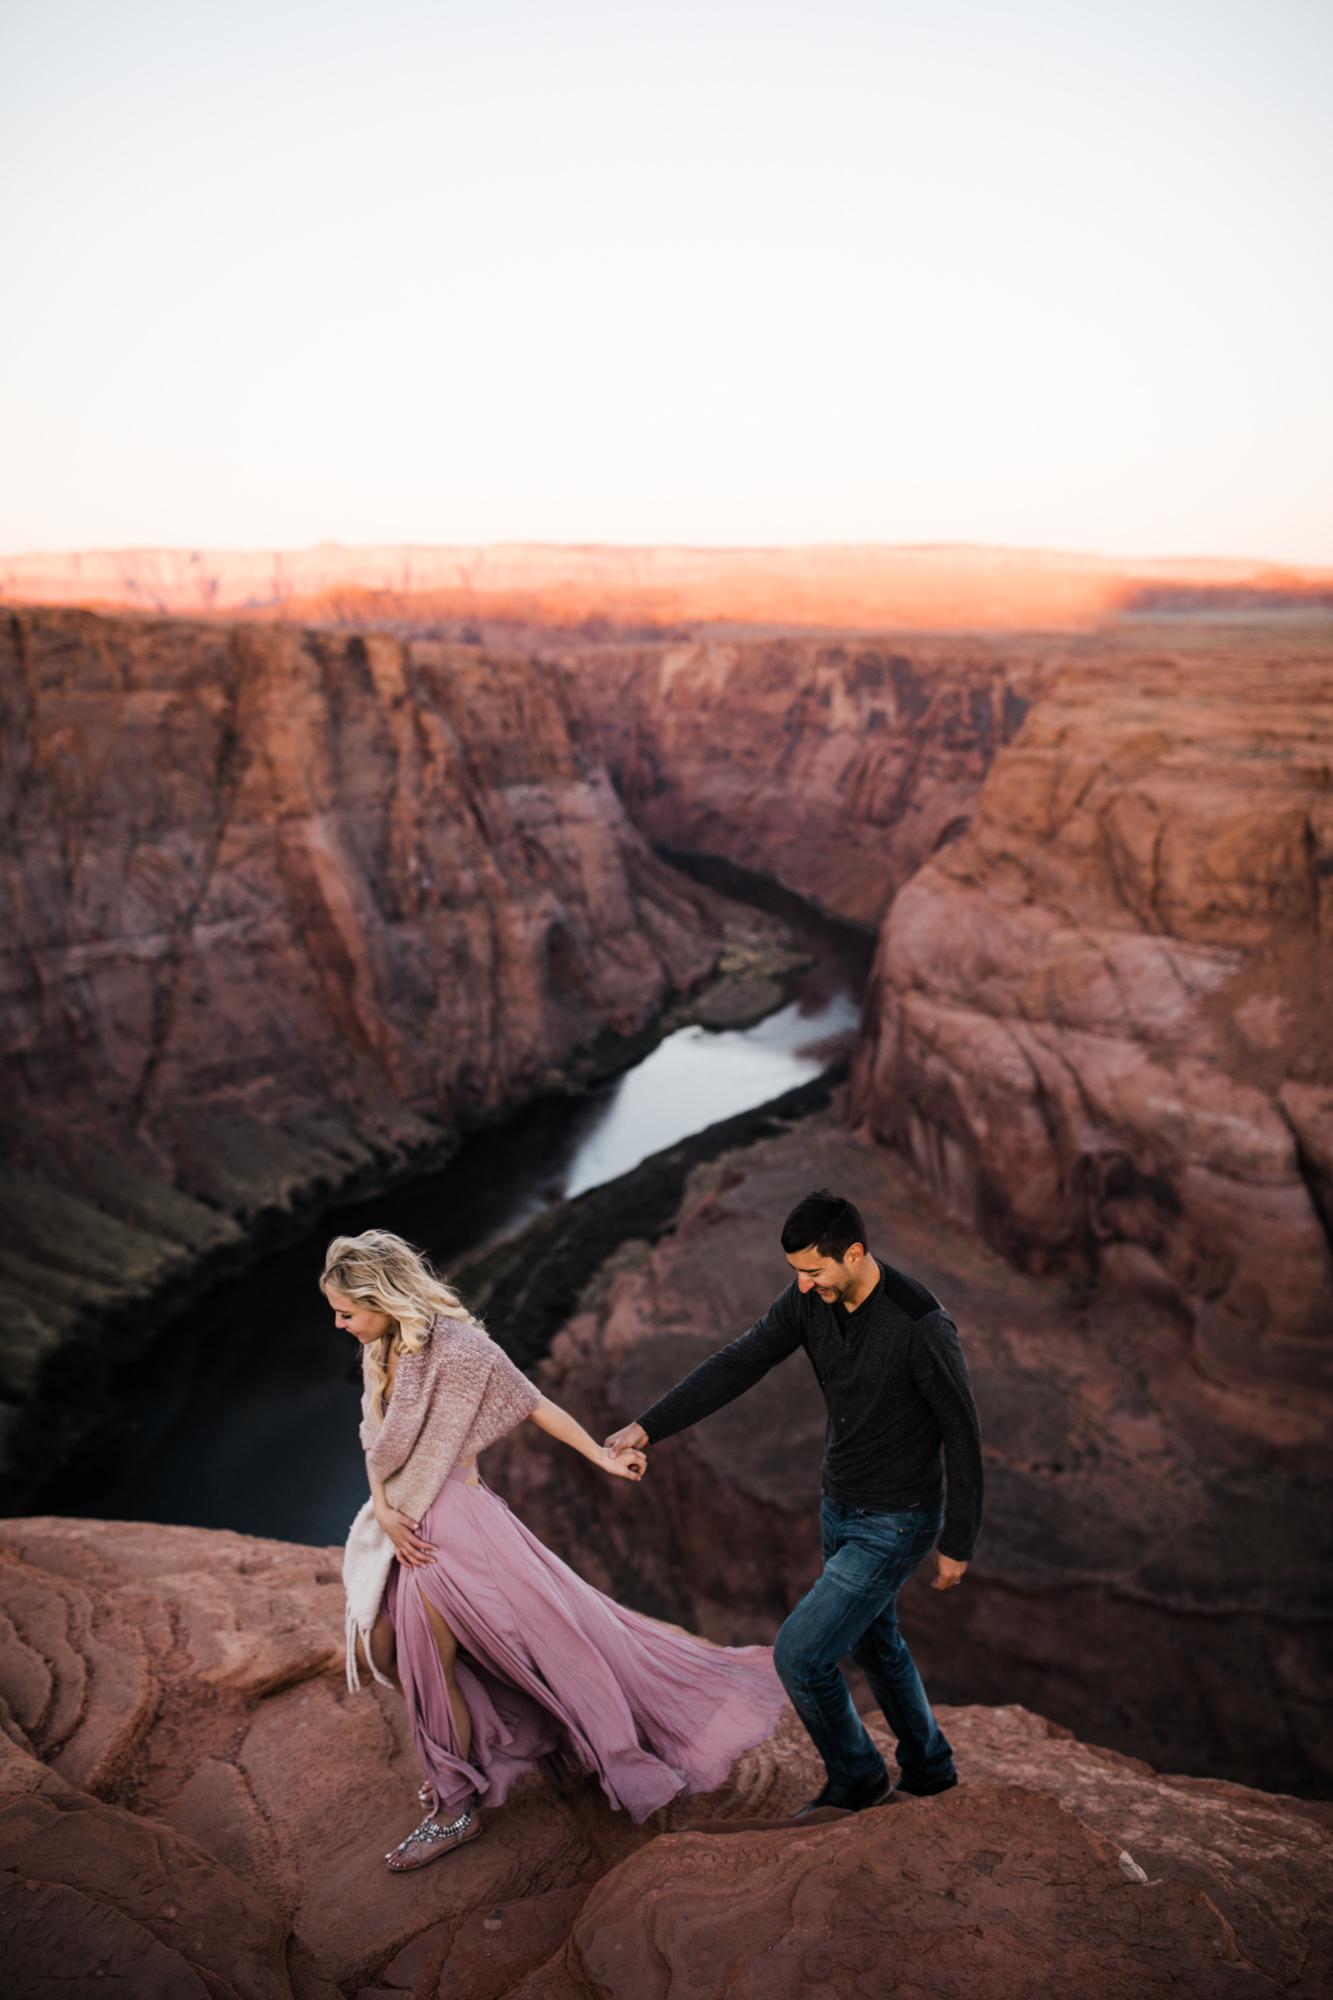 horseshoe bend adventure elopement session | destination engagement photo inspiration | utah adventure elopement photographers | the hearnes adventure photography | www.thehearnes.com